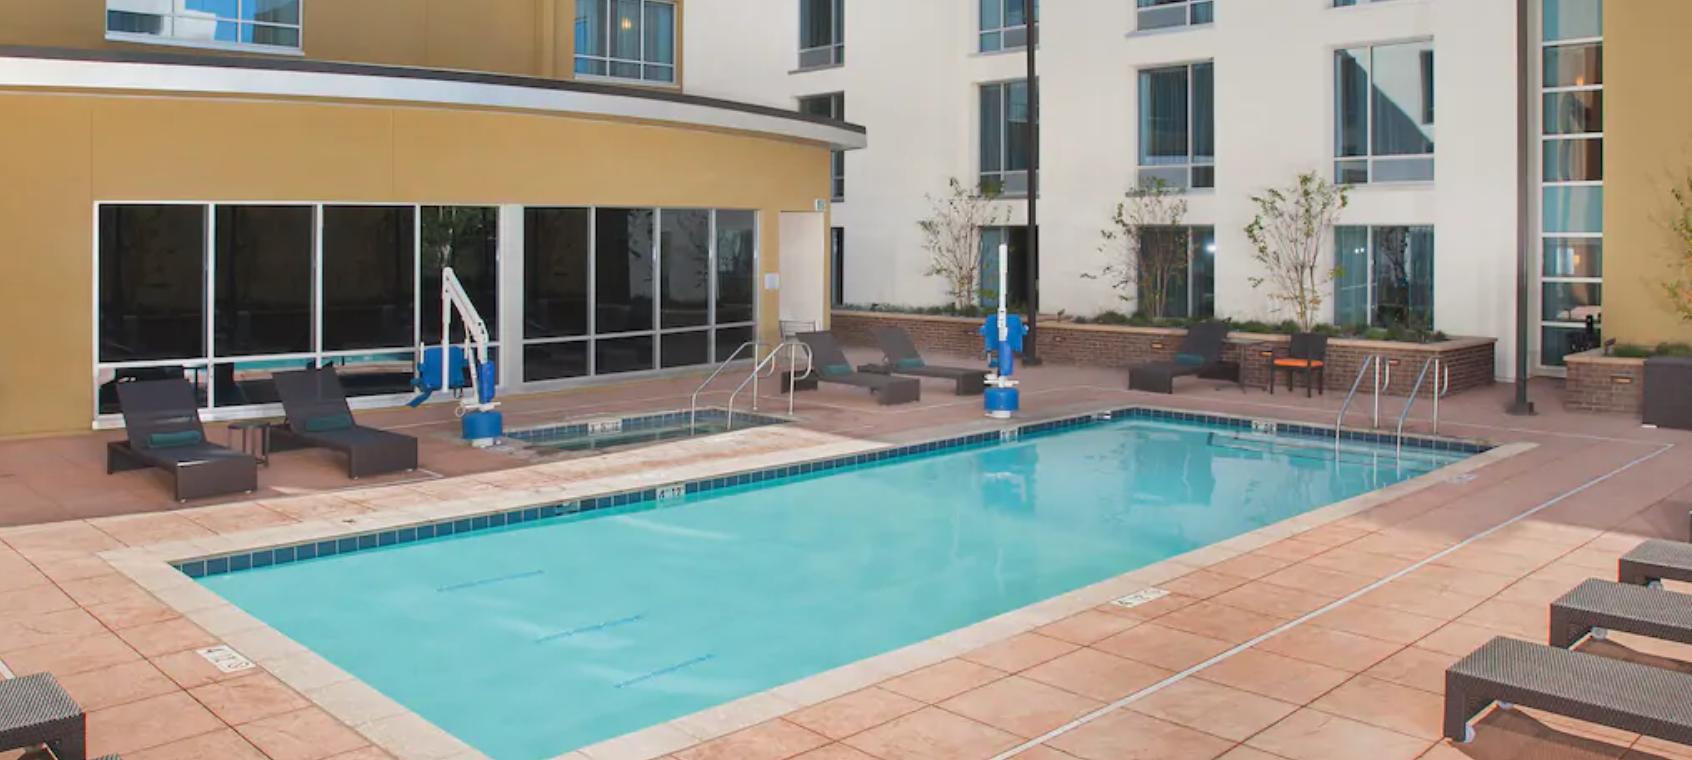 https://www.hotelsbyday.com/_data/default-hotel_image/4/21570/screenshot-2020-08-30-at-10-31-12-pm.png